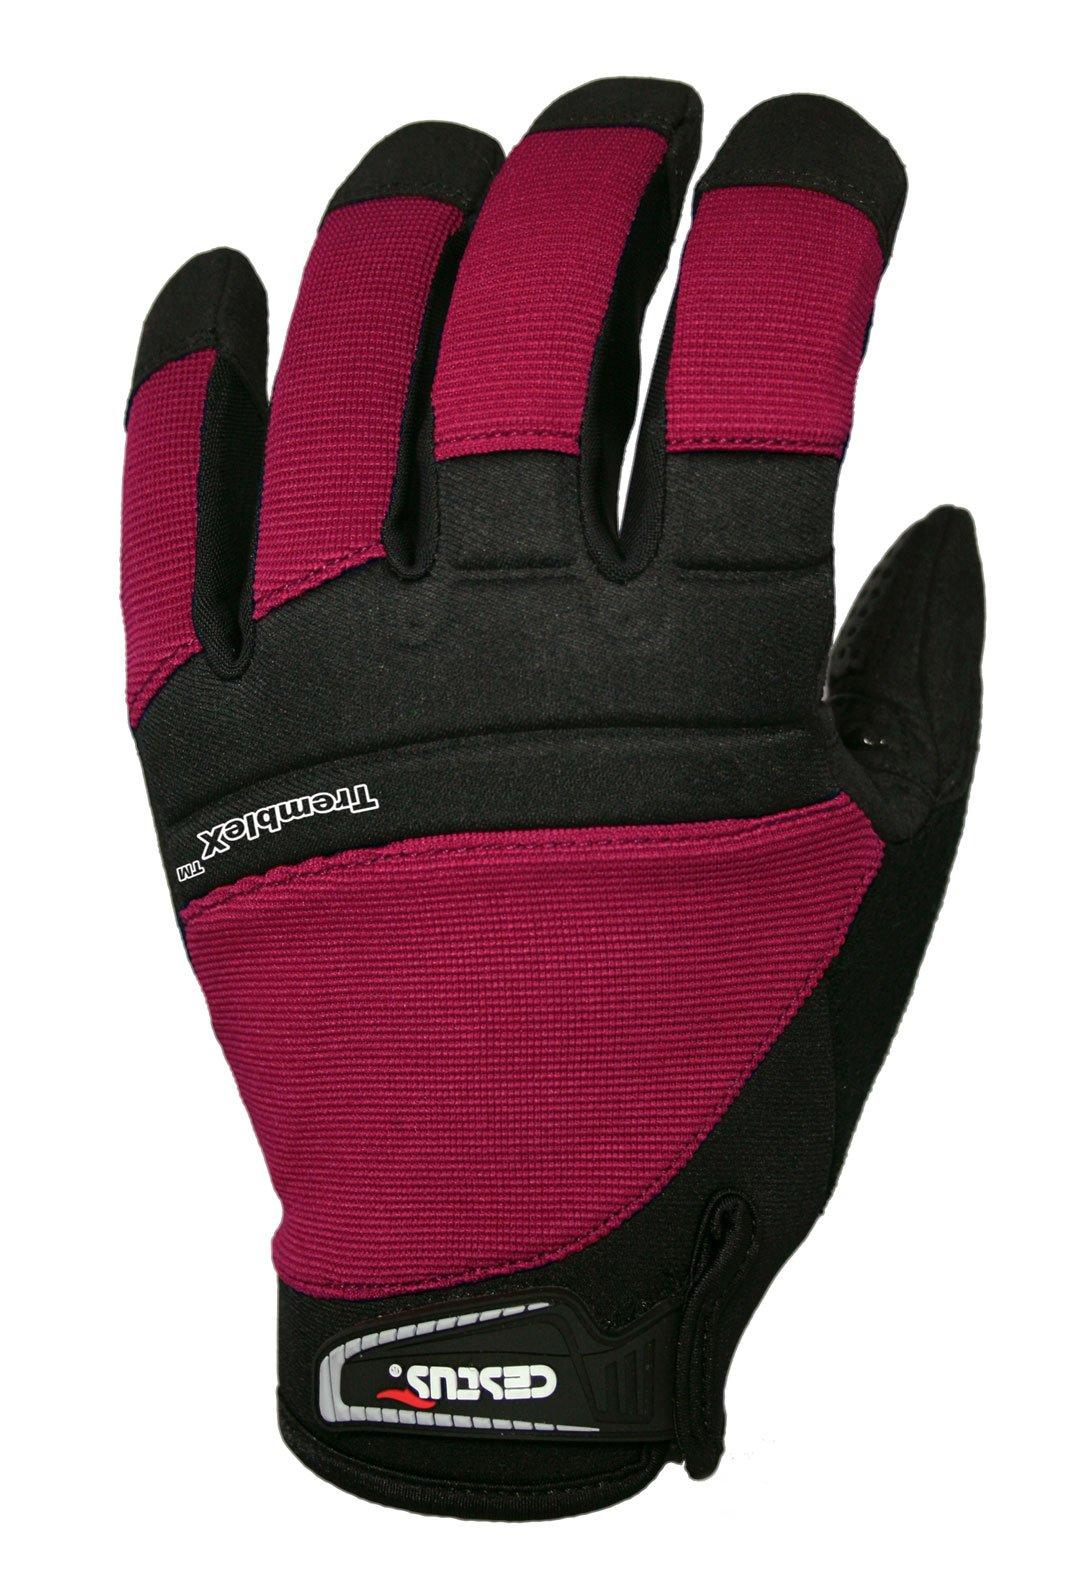 Cestus Vibration Series TrembleX Neoprene Polychloroprene Anti-Vibration Glove, Work, Large, Red (Pack of 1 Pair)